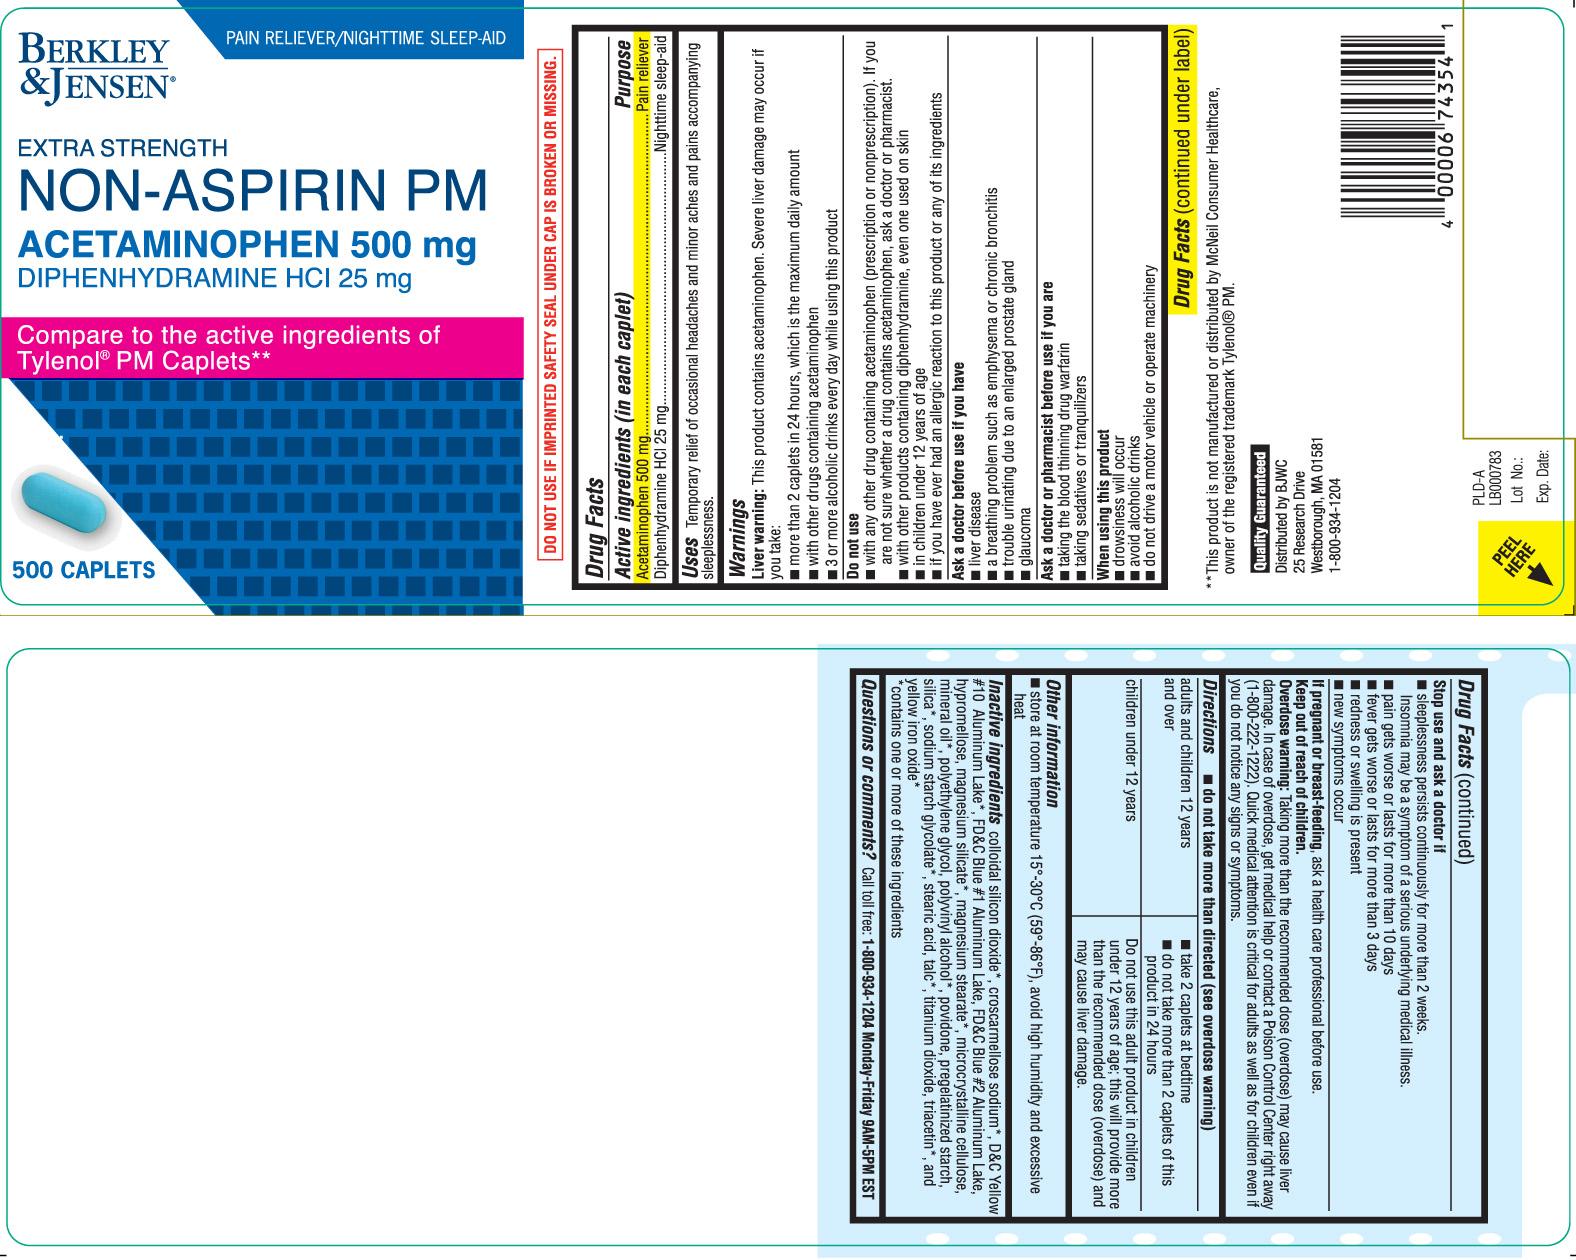 ACETAMINOPHEN 500 mg, DIPHENHYDRAMINE 25 mg